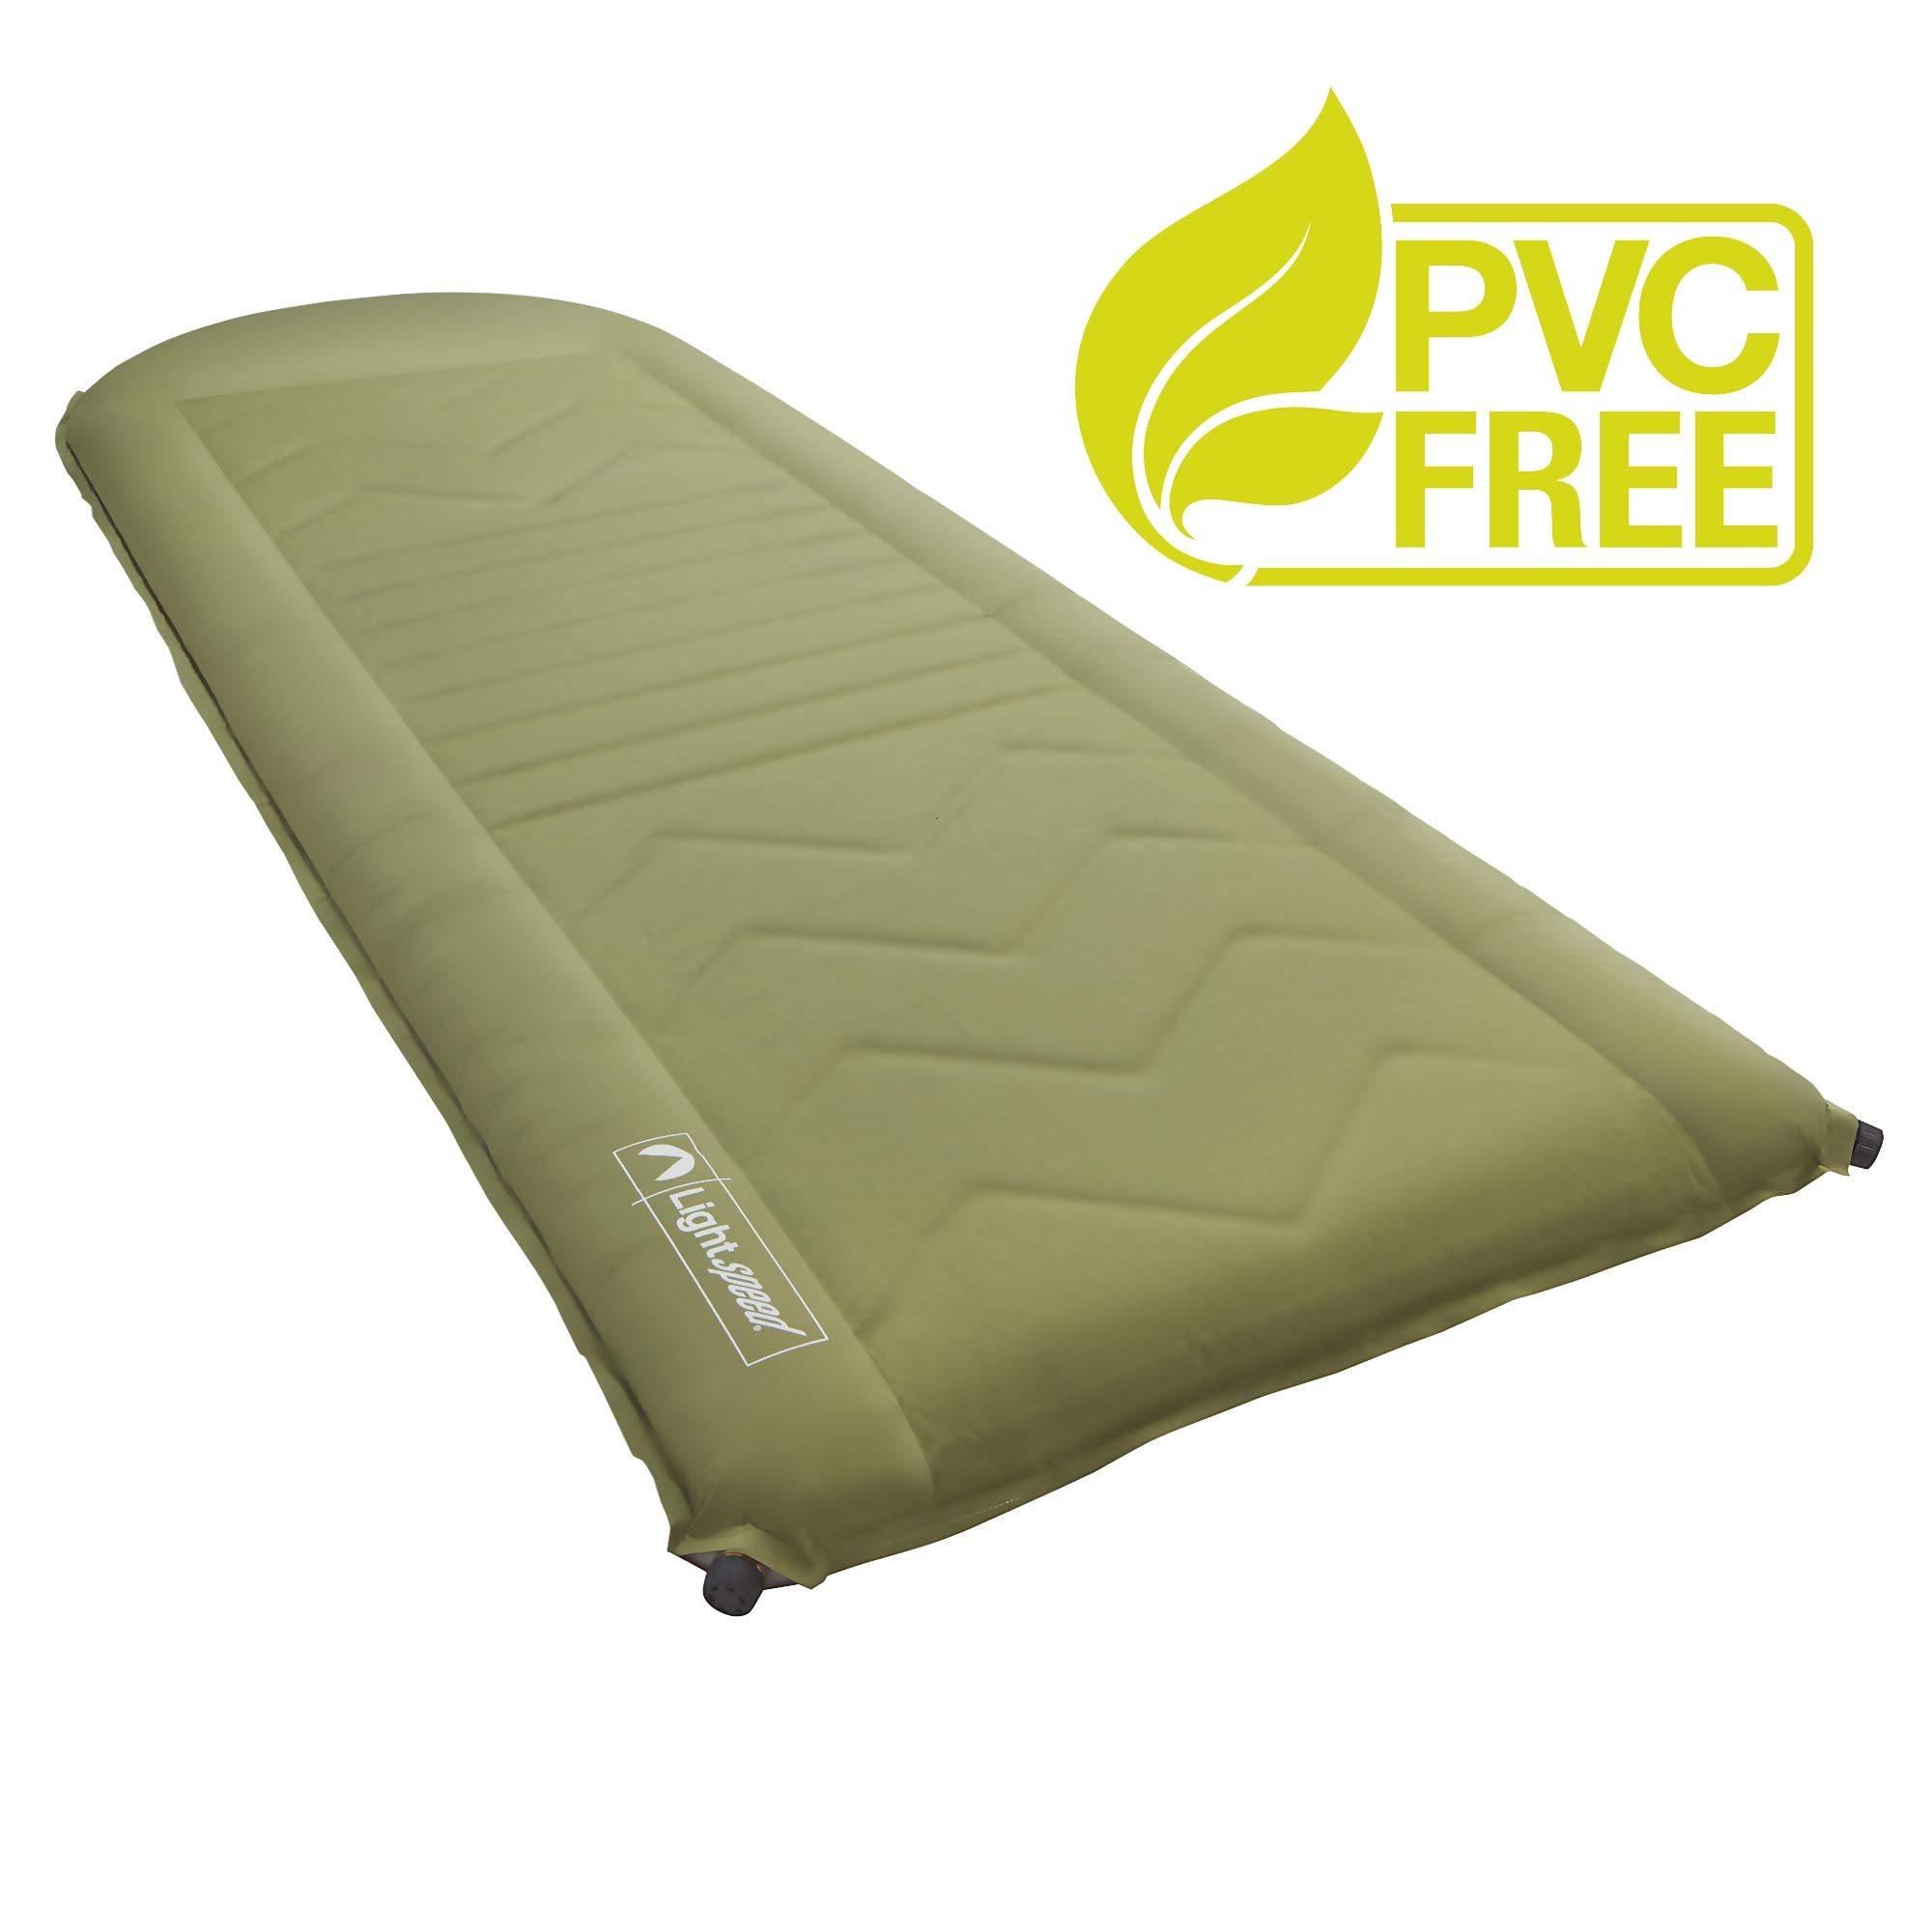 Lightspeed Outdoors Self Inflating Sleep Pad (Green/Brown) by Lightspeed Outdoors